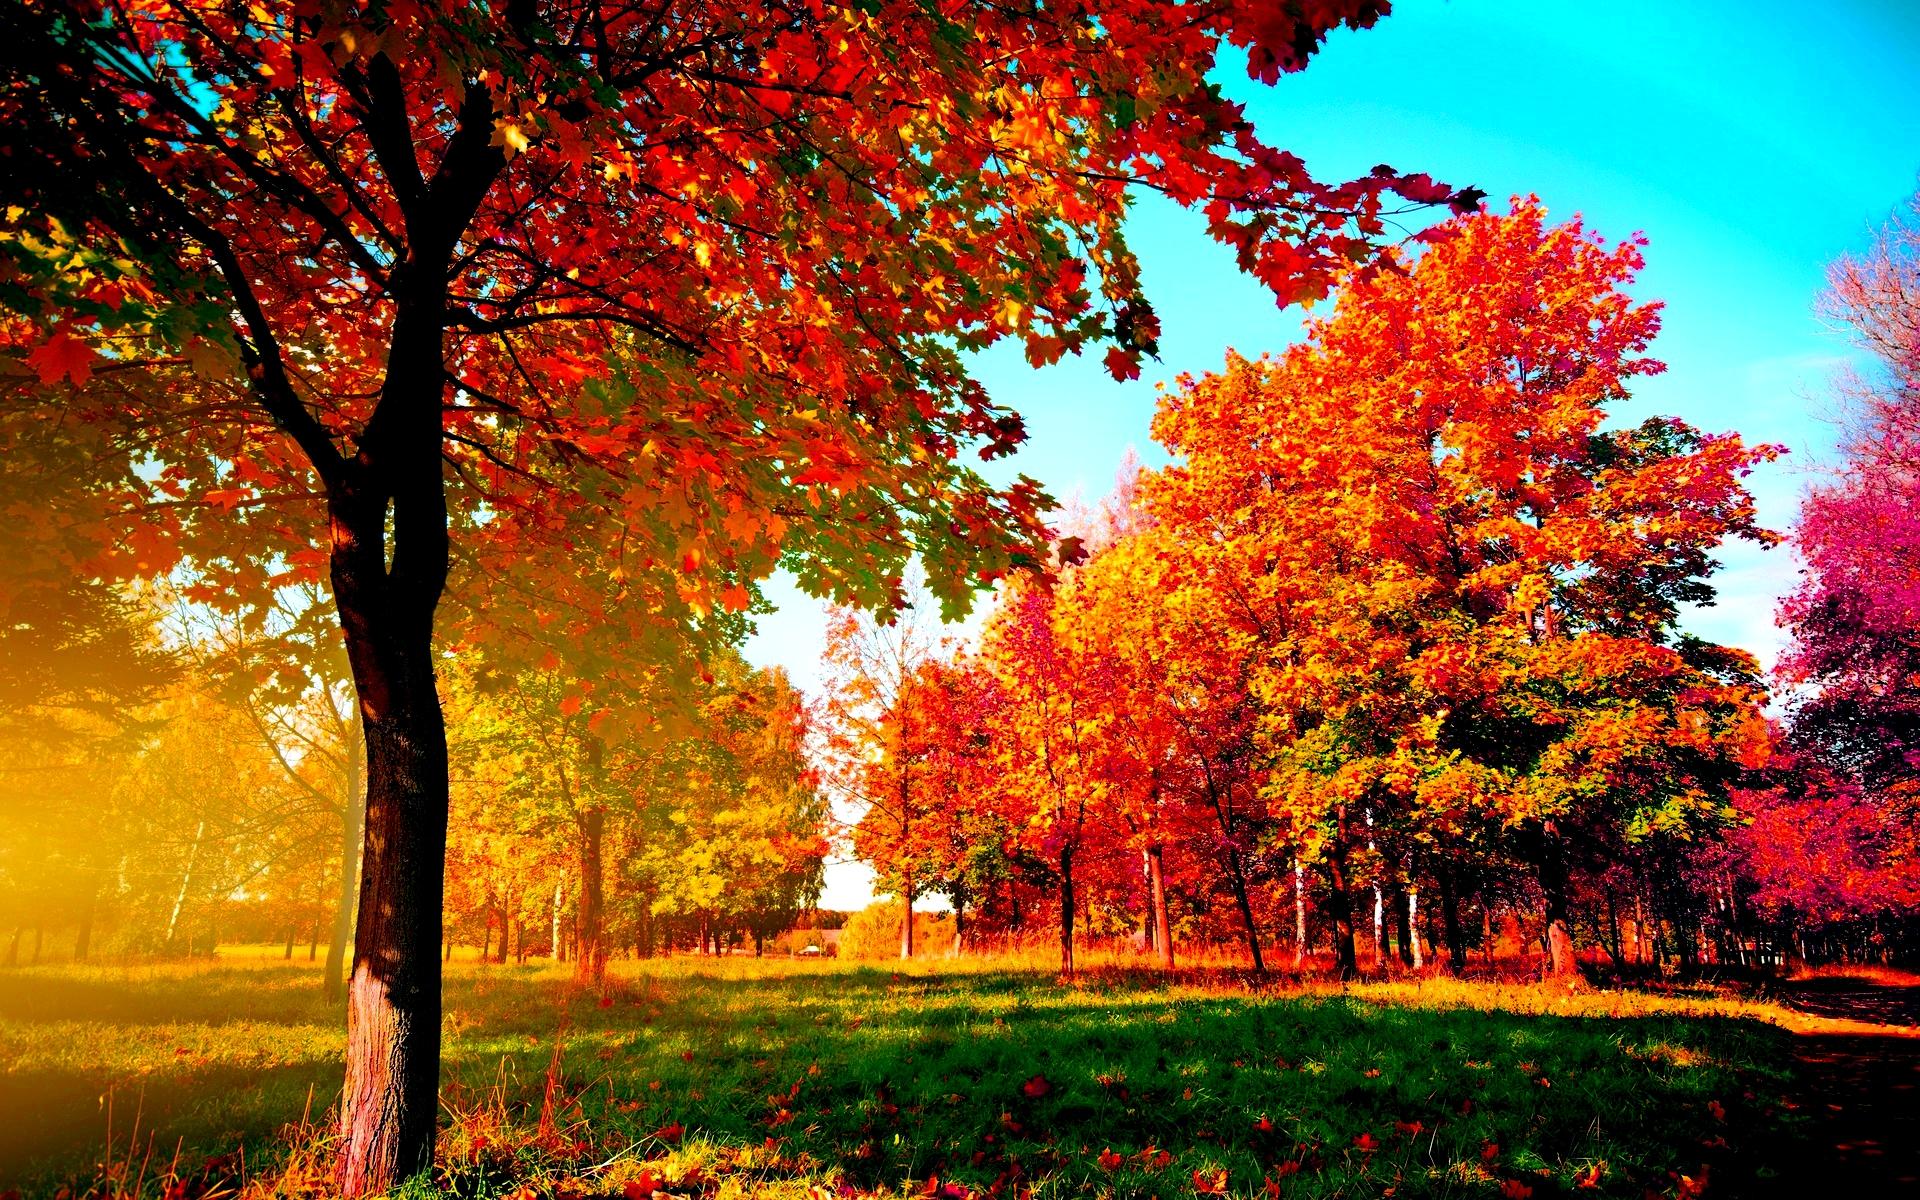 Fall Computer Images Free Download | PixelsTalk Net